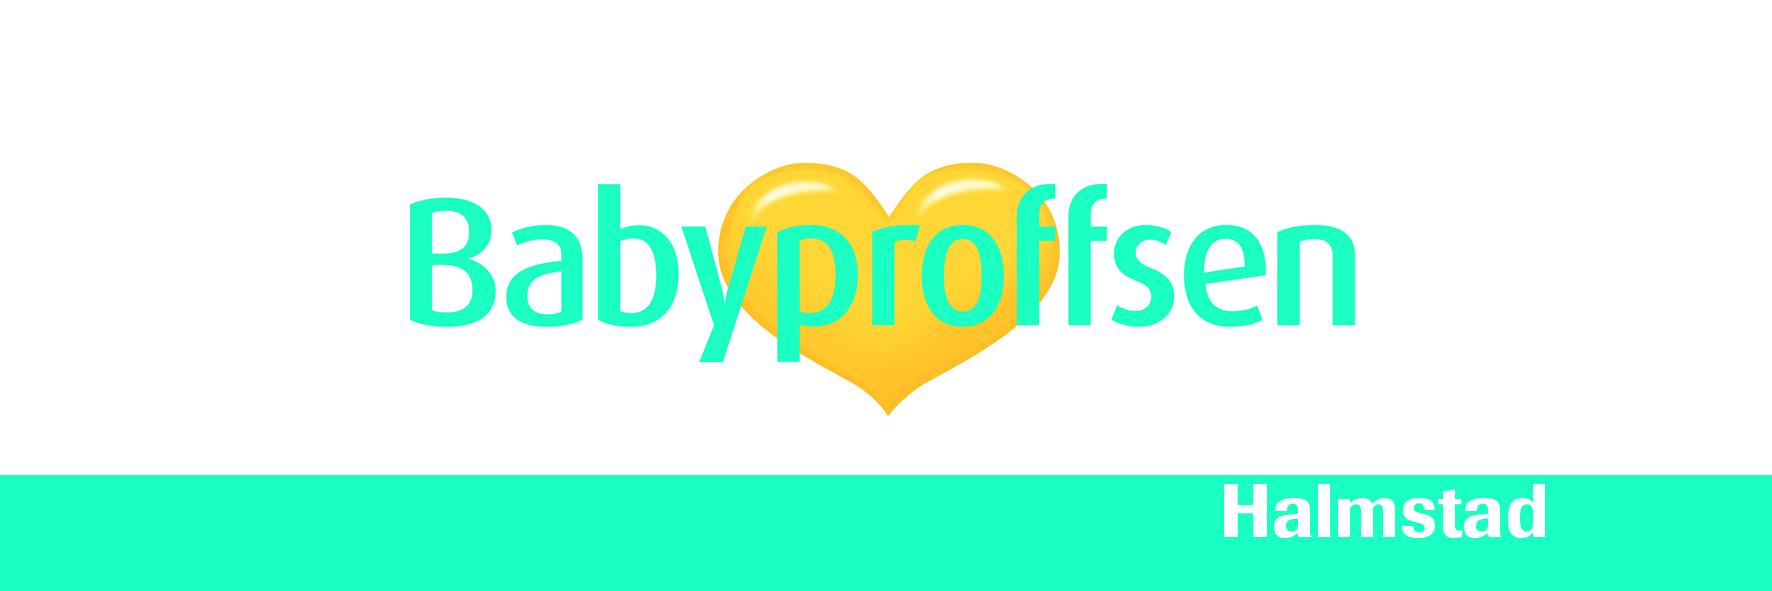 logo Babyproffsen Halmstad 151120